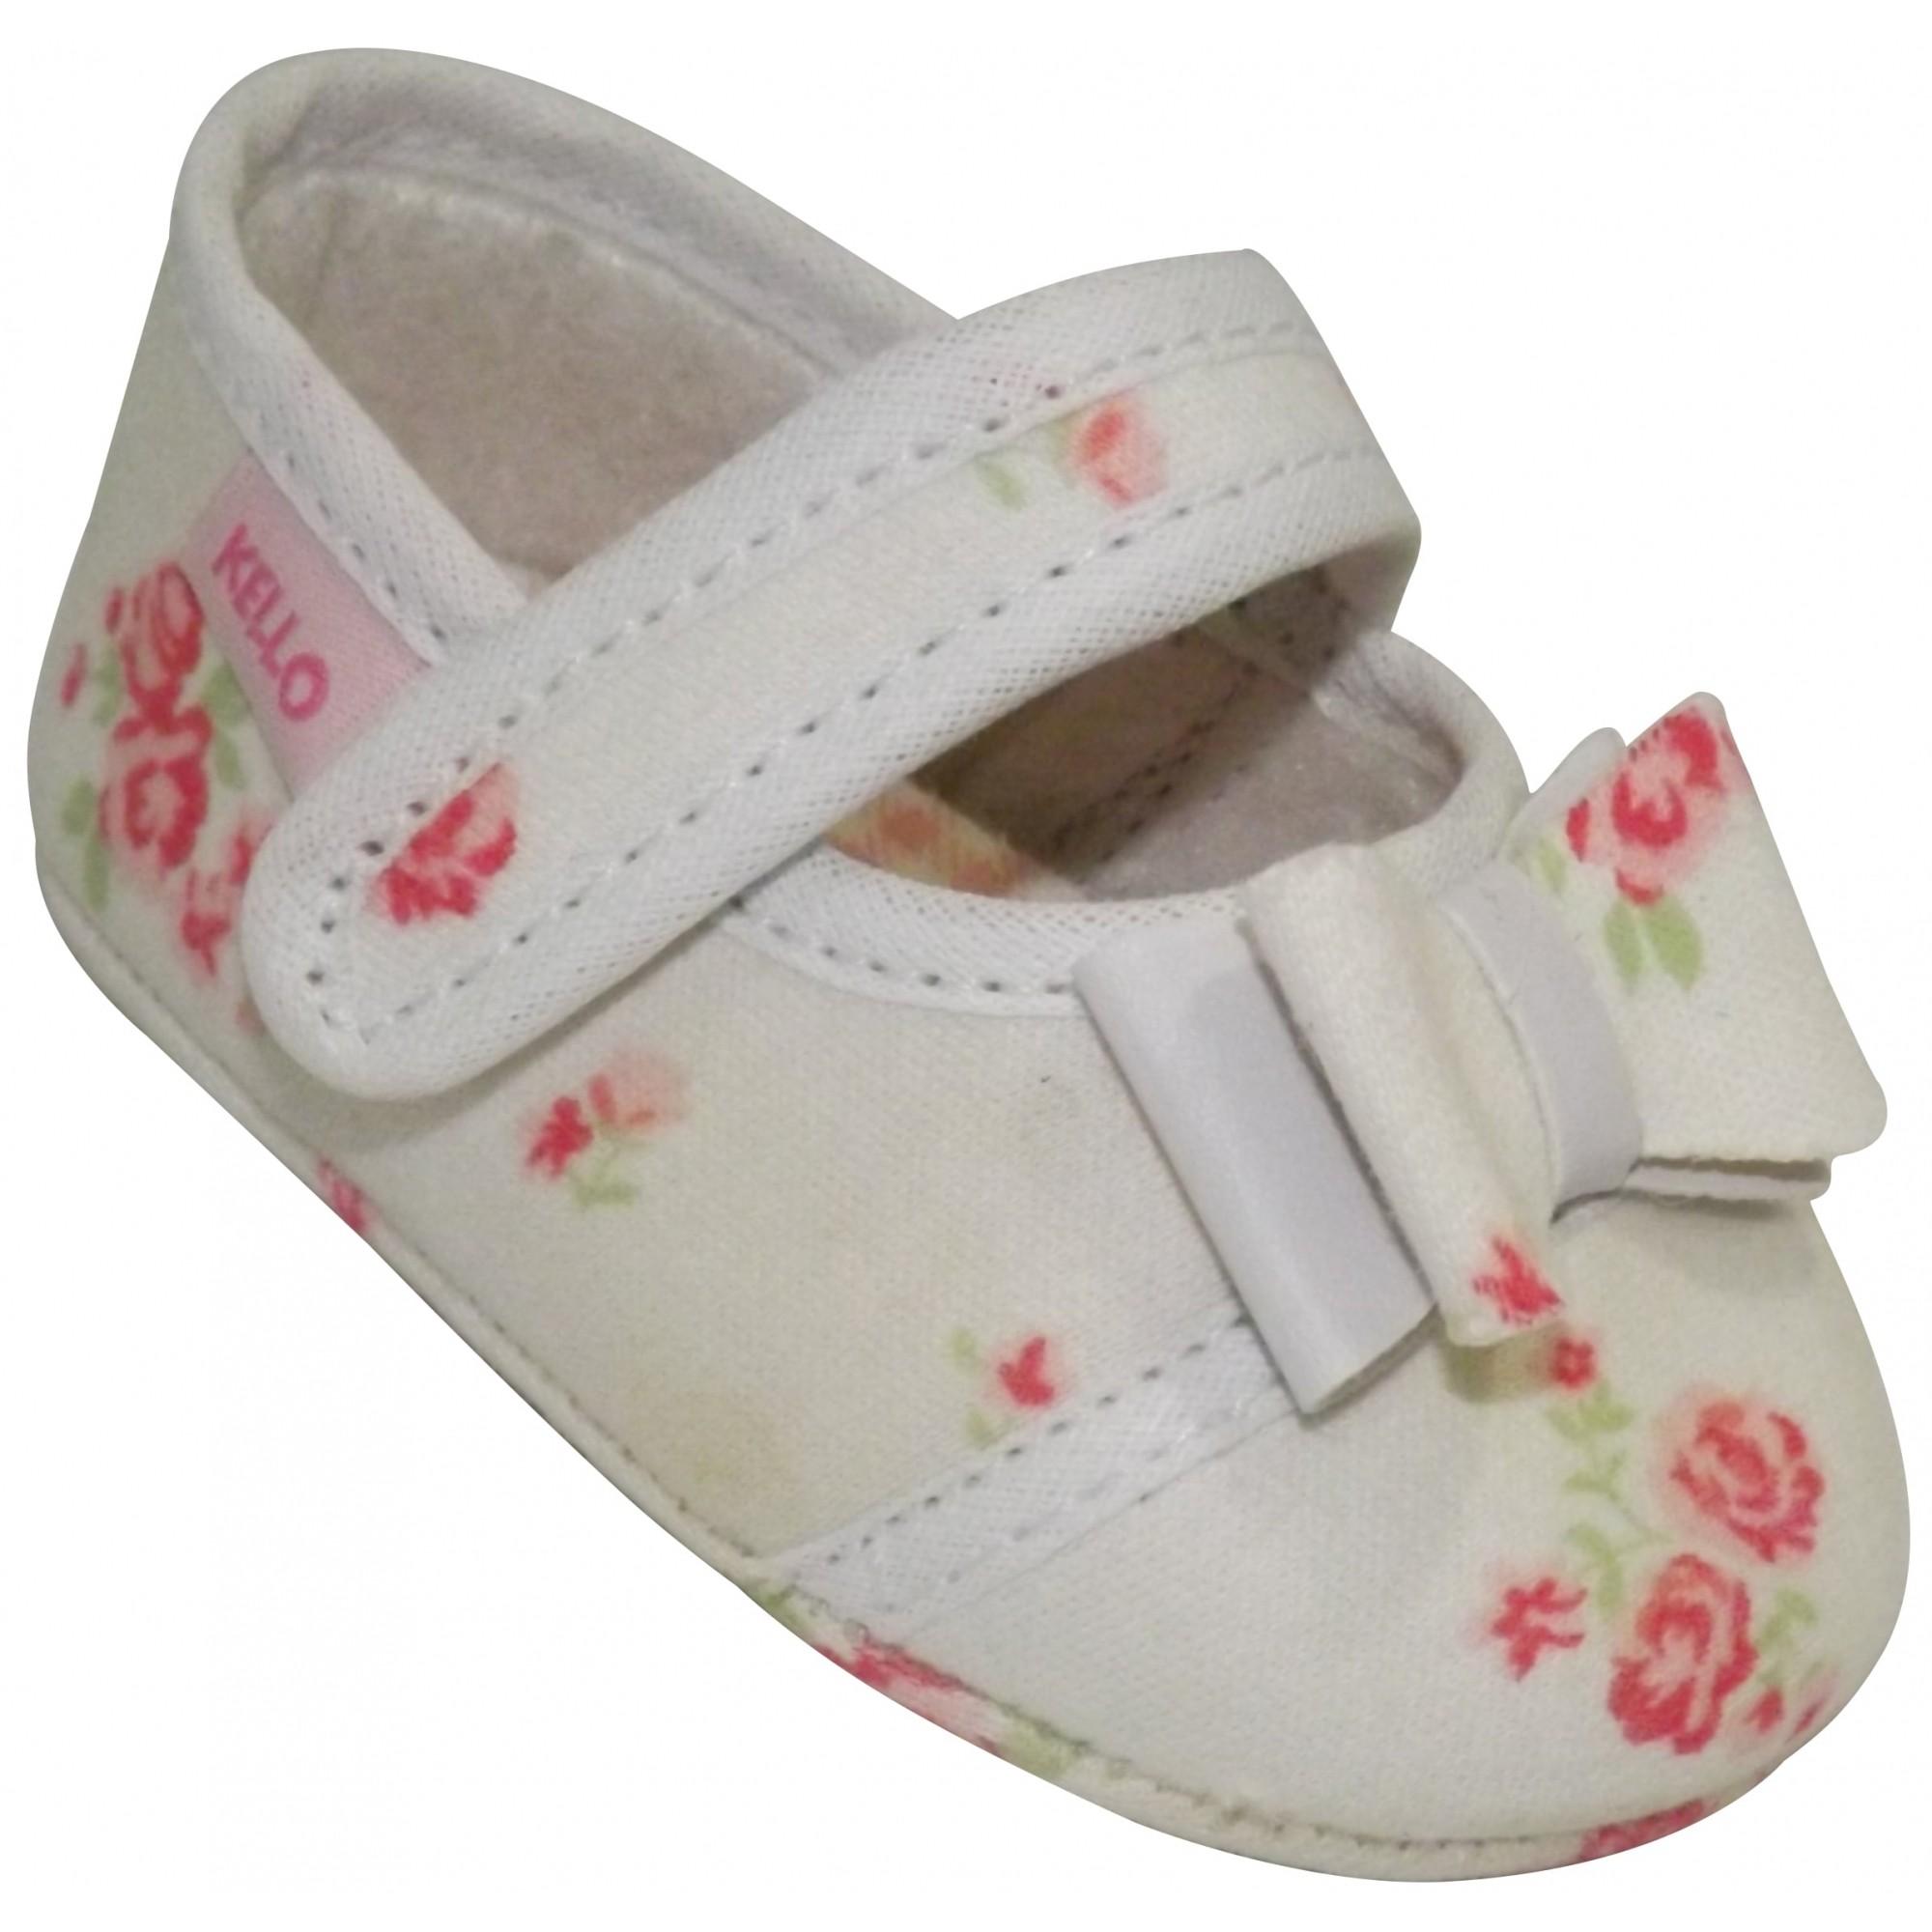 Sapatilha Infantil Floral Menina com Laço e Velcro Off White